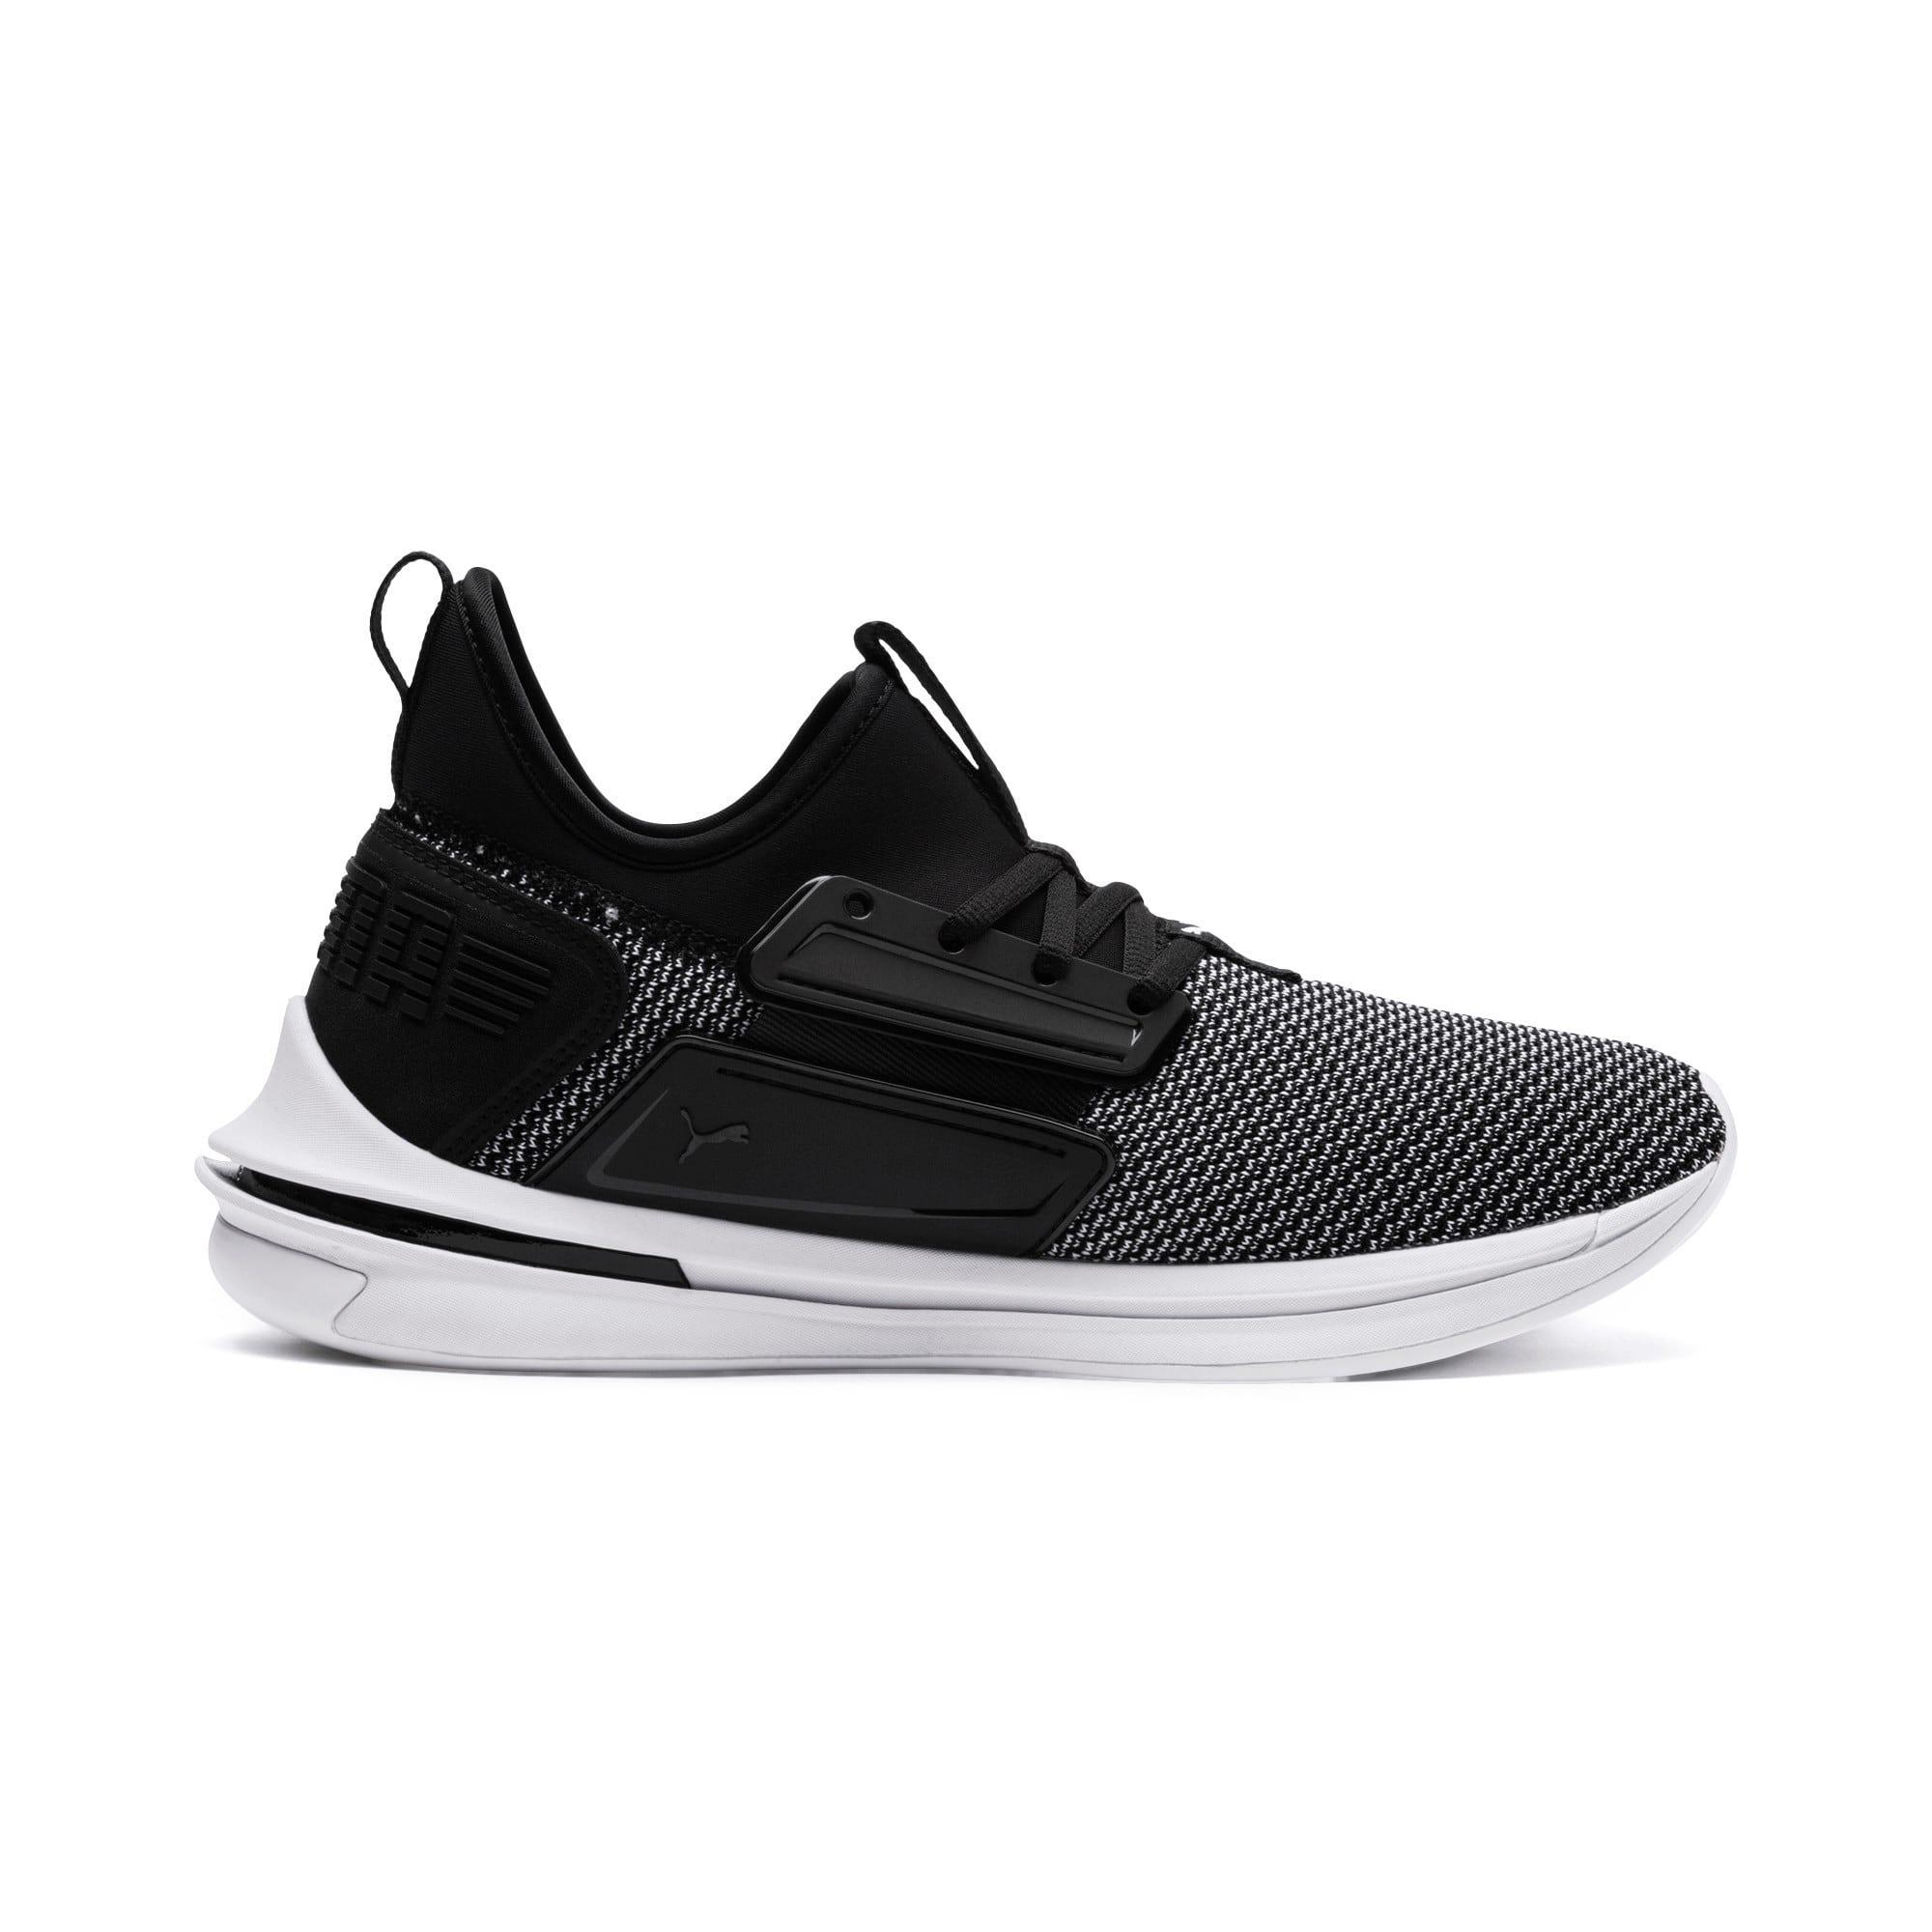 Thumbnail 5 of IGNITE Limitless SR New School Sneakers, Puma Black-Puma White, medium